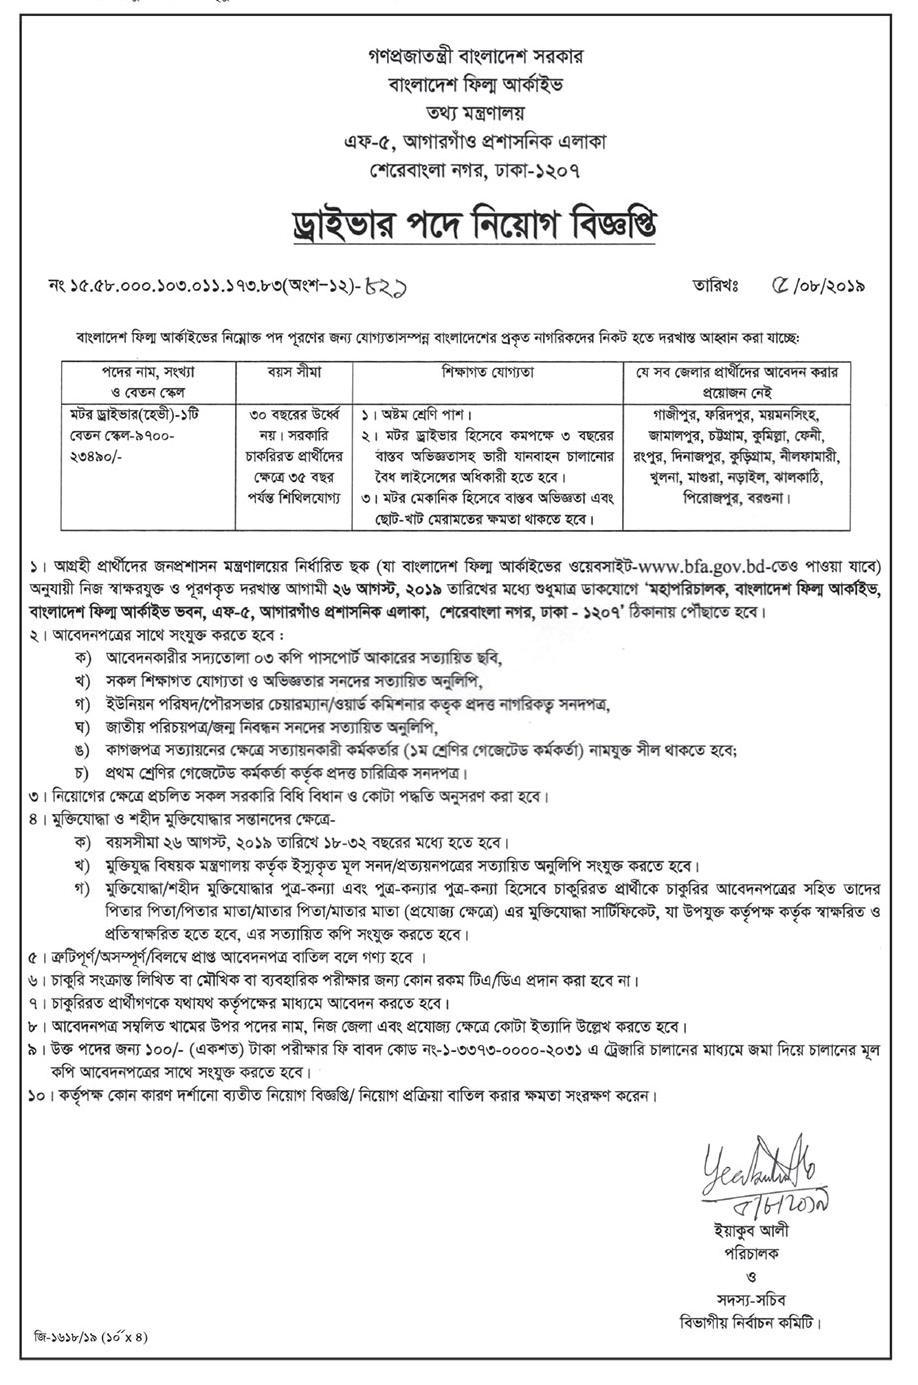 Ministry Of Information MOI Job Circular 2019